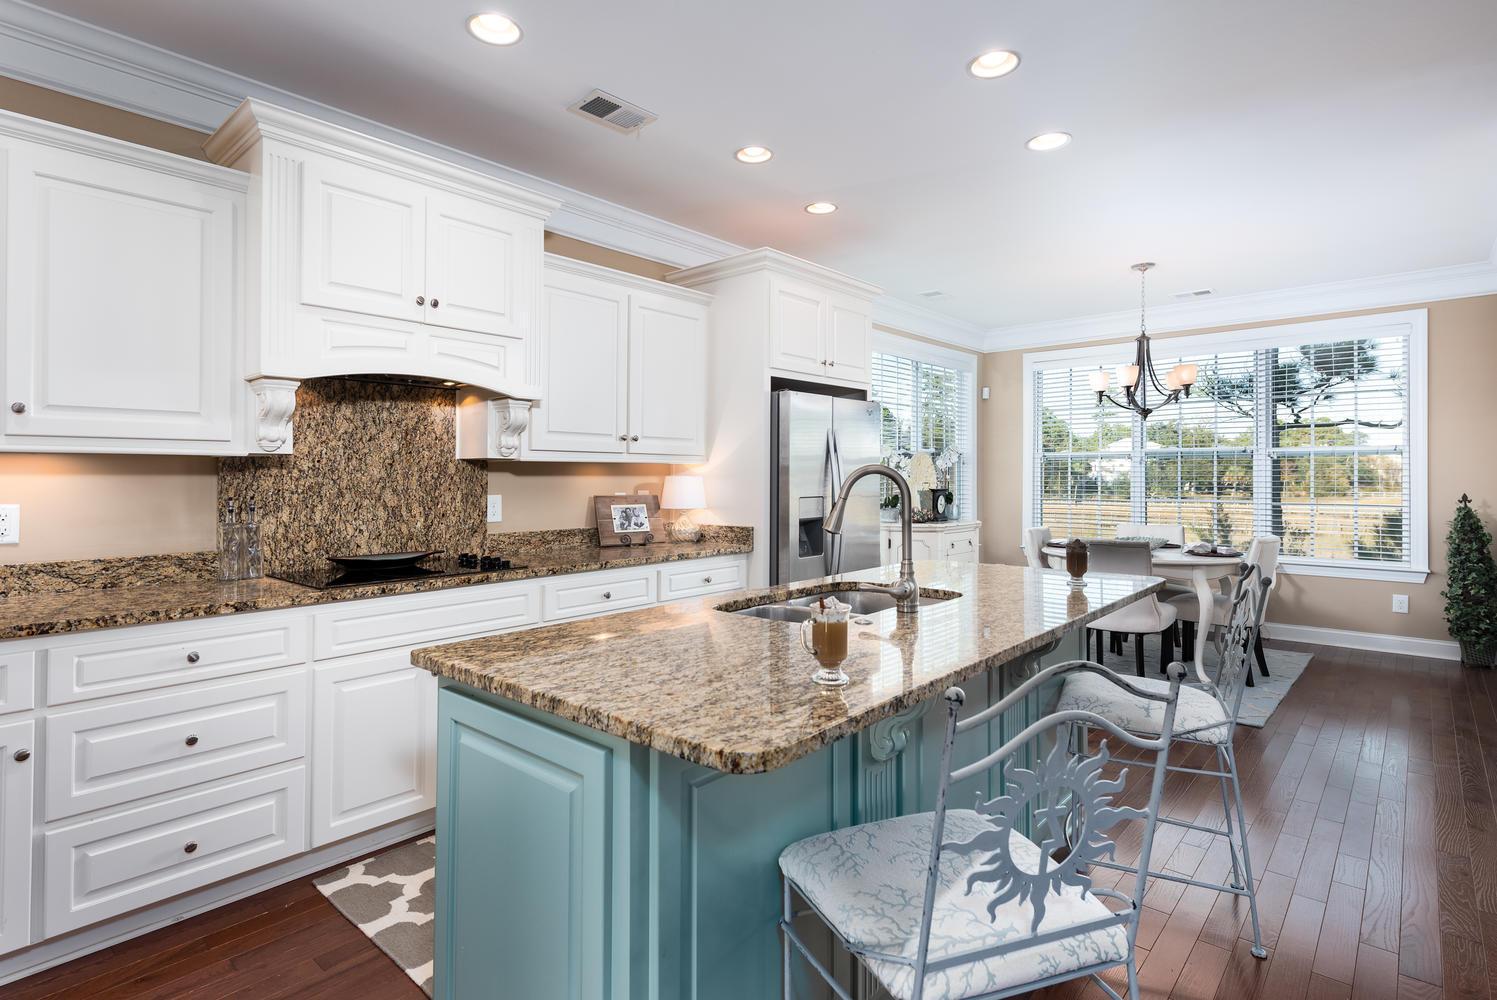 River Reach Pointe Homes For Sale - 1216 Rivers Reach Drive, Charleston, SC - 4